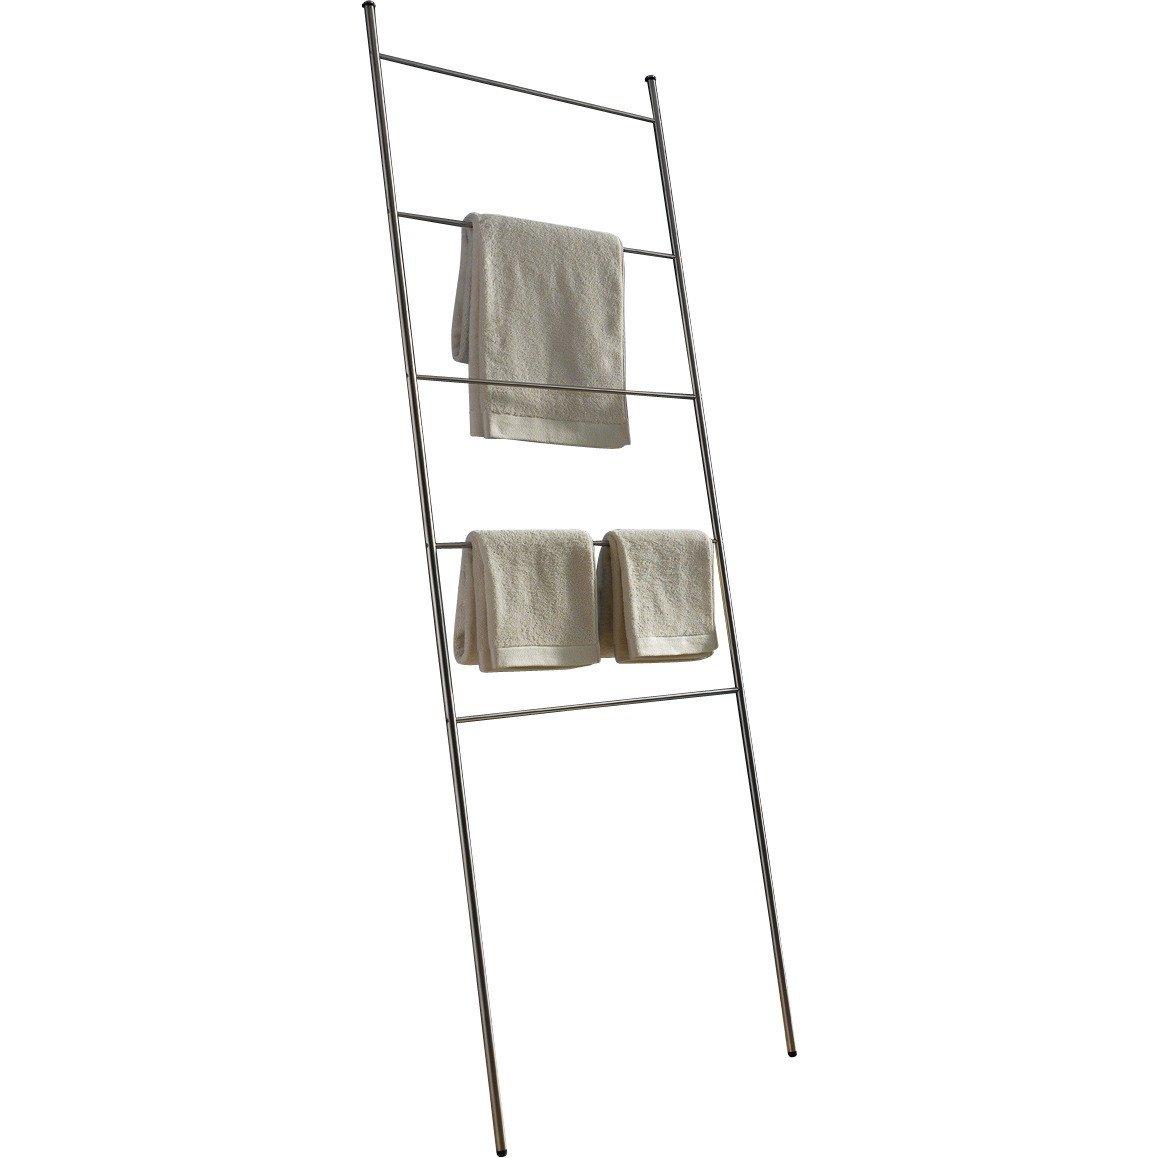 PSBA Standing Towel Rack Ladder for Bathroom Spa Towel Hanger, Steel Matte